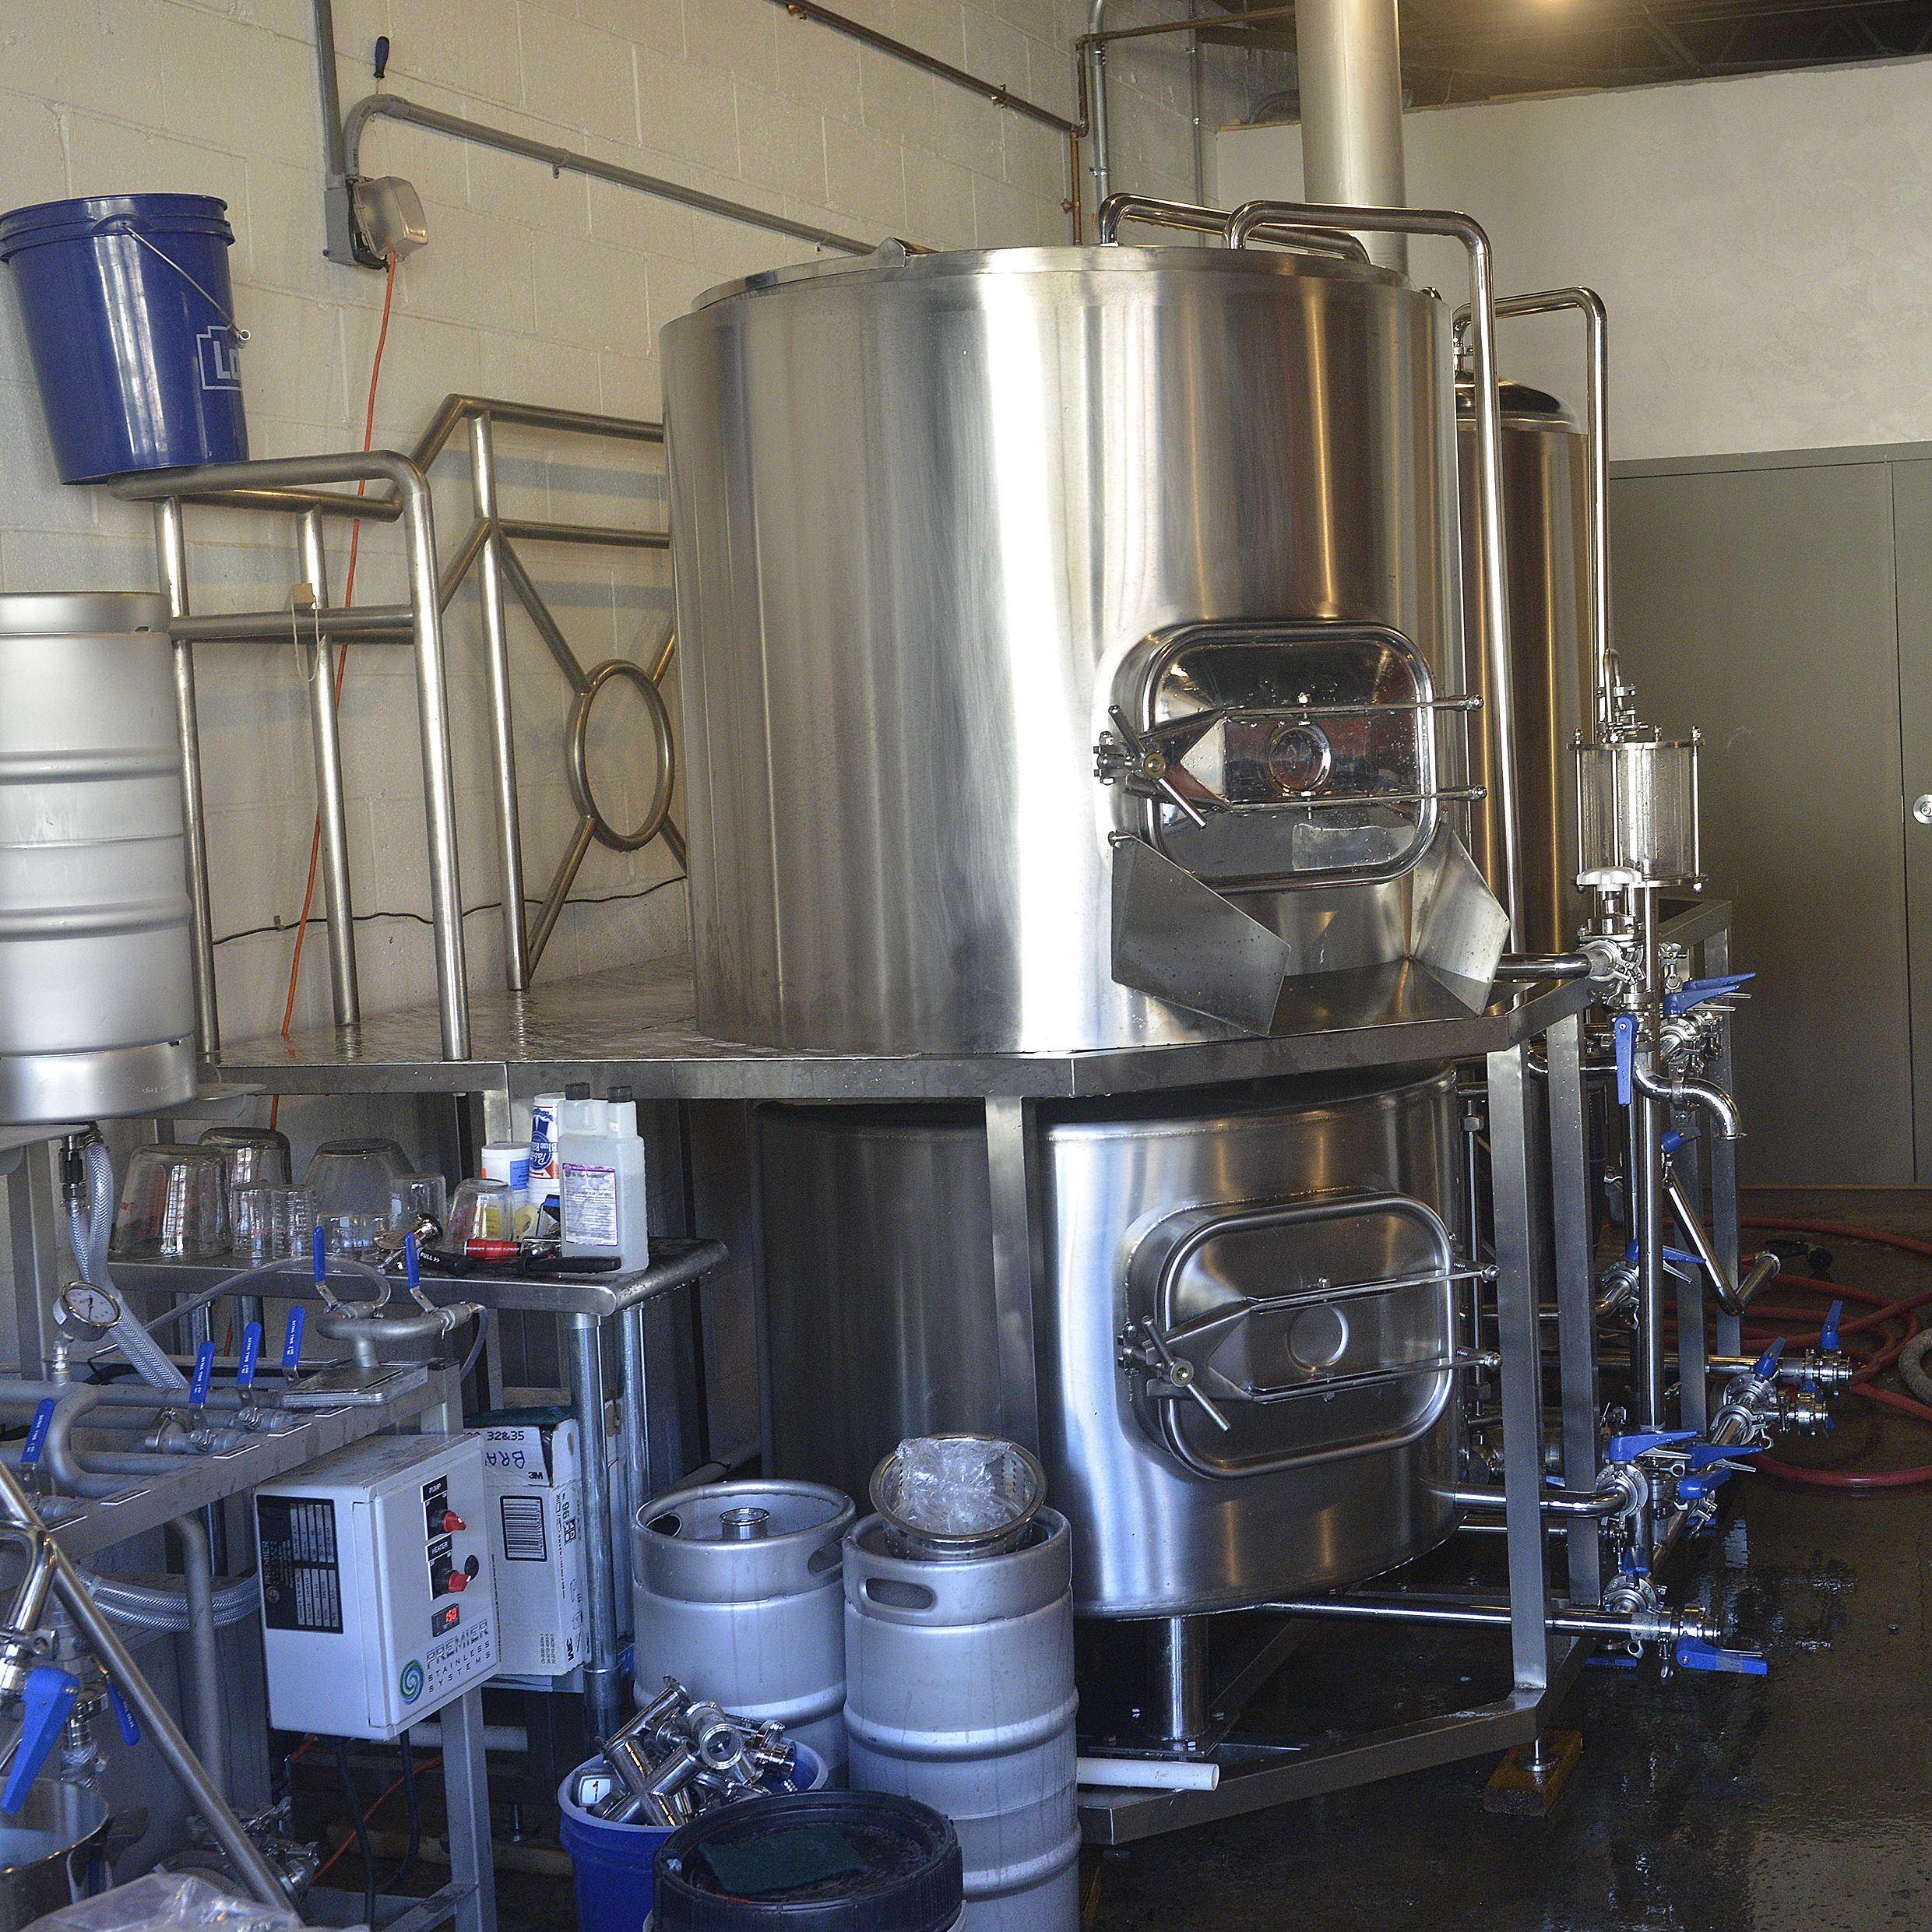 20151115lrinsurrectionmag04-10 Fermentation tanks for the Insurrection AleWorks.